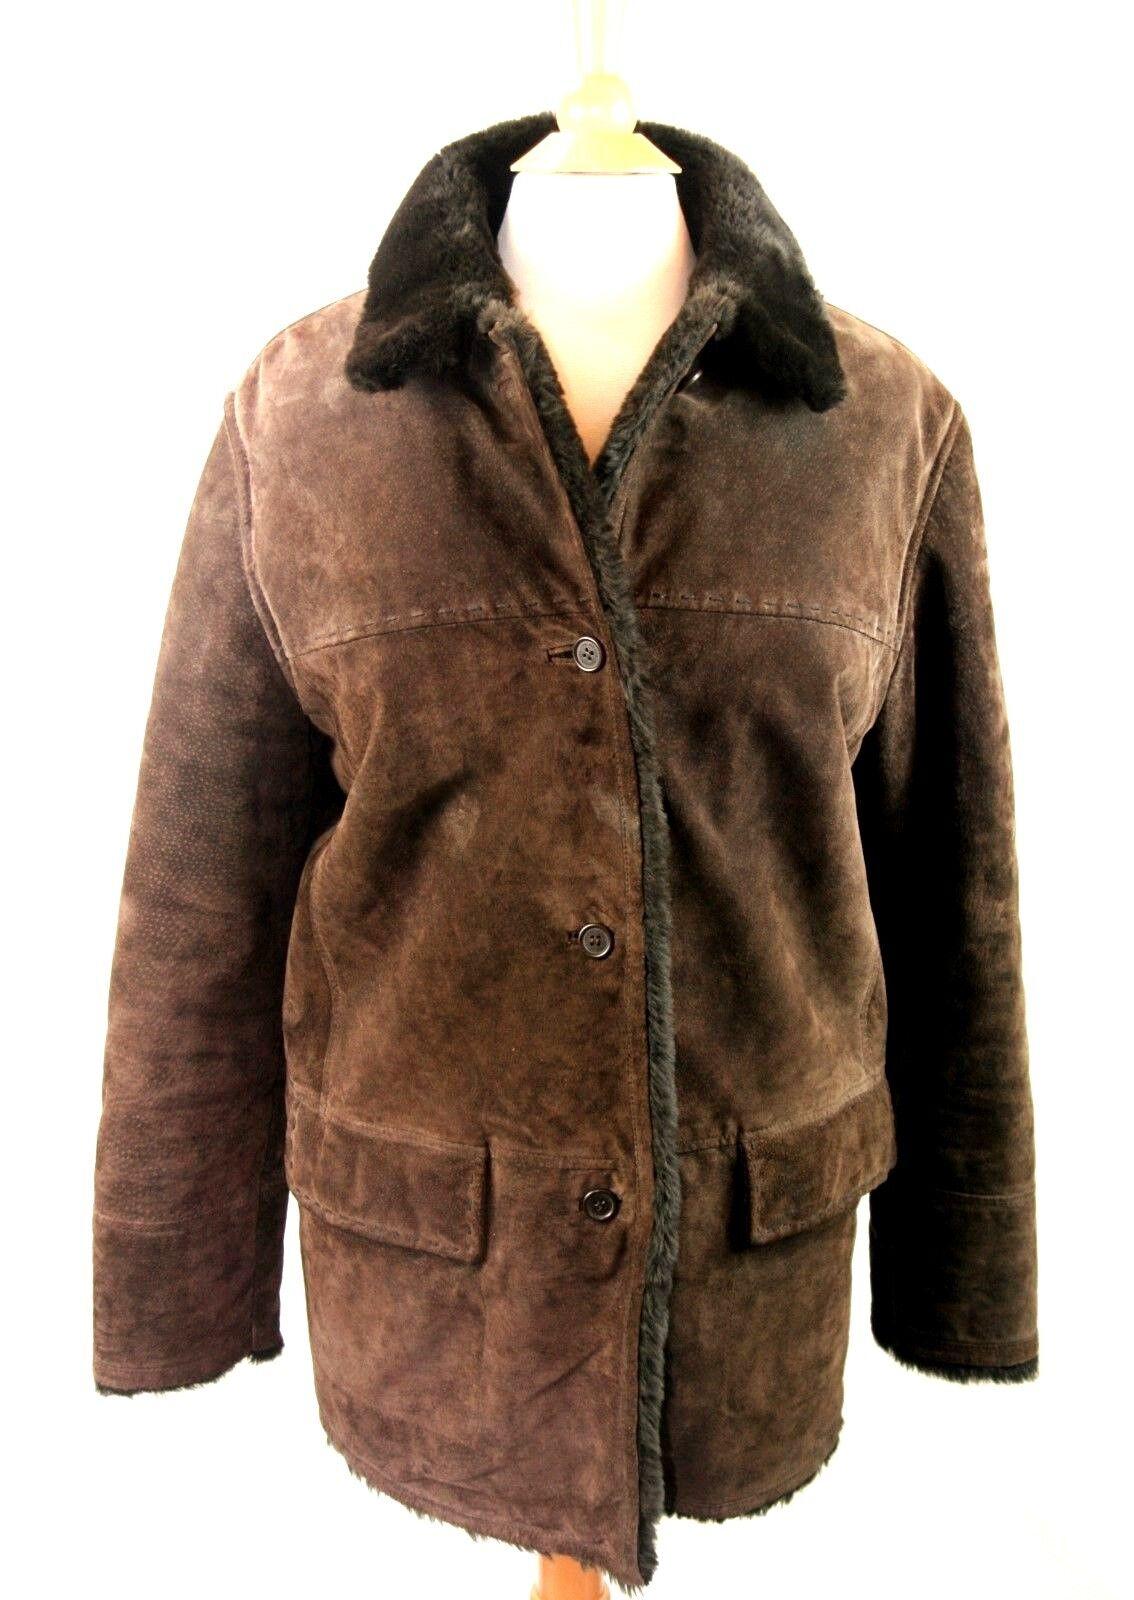 Jones New York Sport Size Medium Chocolate Brown Leather Coat Faux Fur Lining